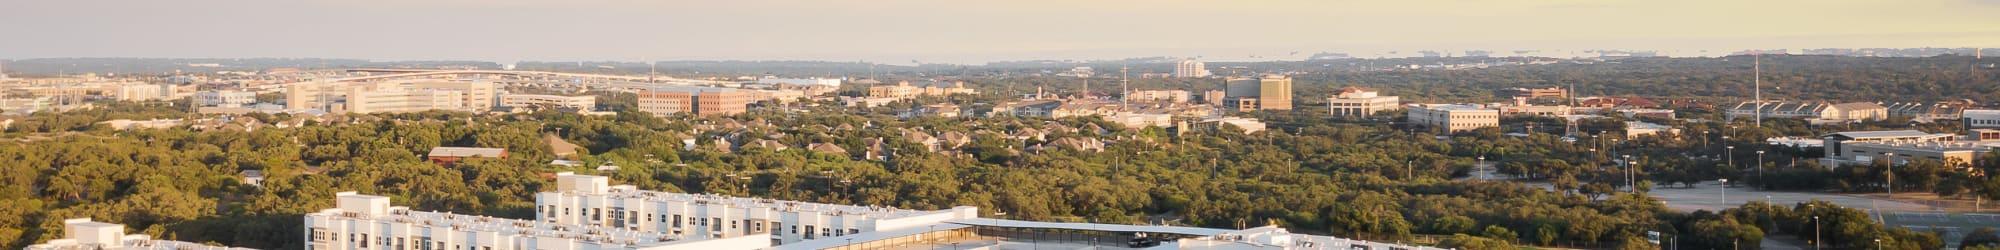 Neighborhood near The Abbey at Sonterra in San Antonio, Texas